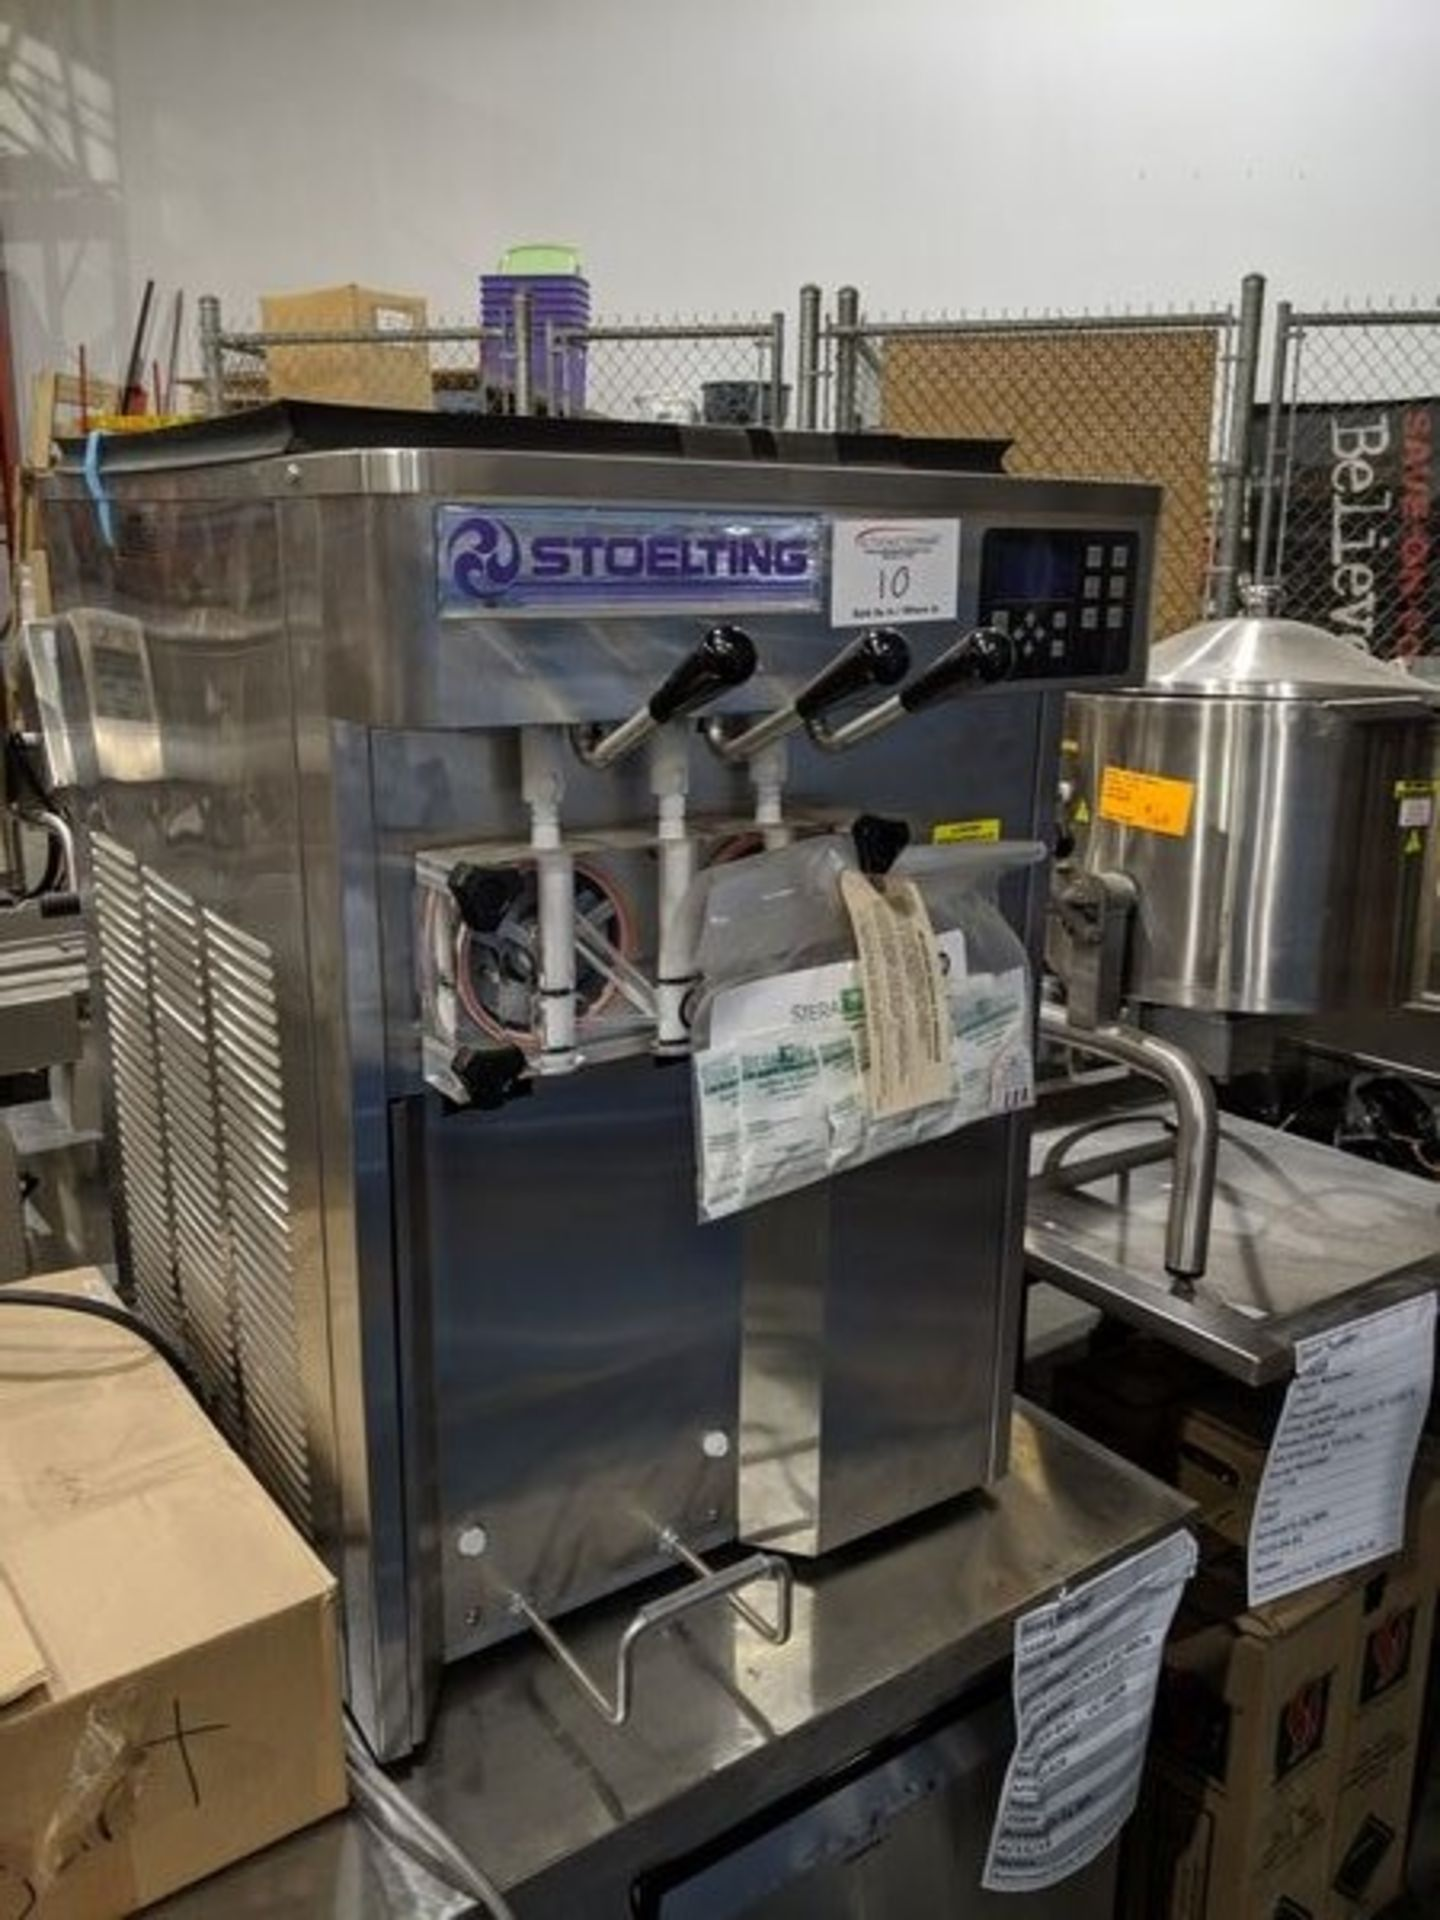 Lot 10 - Unused Stoelting F131 Countertop Soft Serve Yogurt Machine, Single Phase, Air Cooled